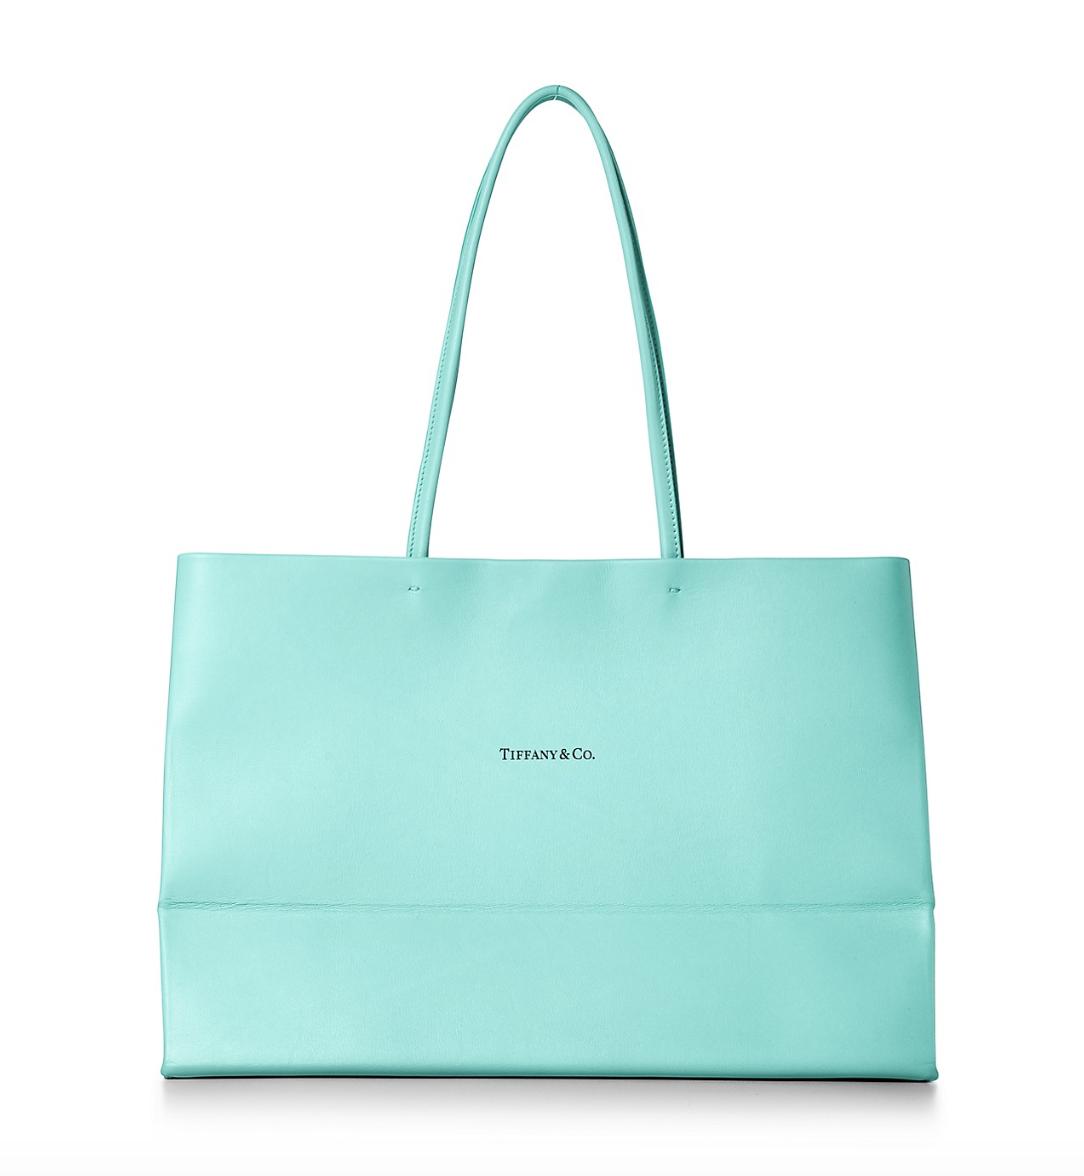 Borse Tiffany.Tiffany Crea La Borsa In Pelle Ipirata Alle Sue Shopper Wondernet Magazine